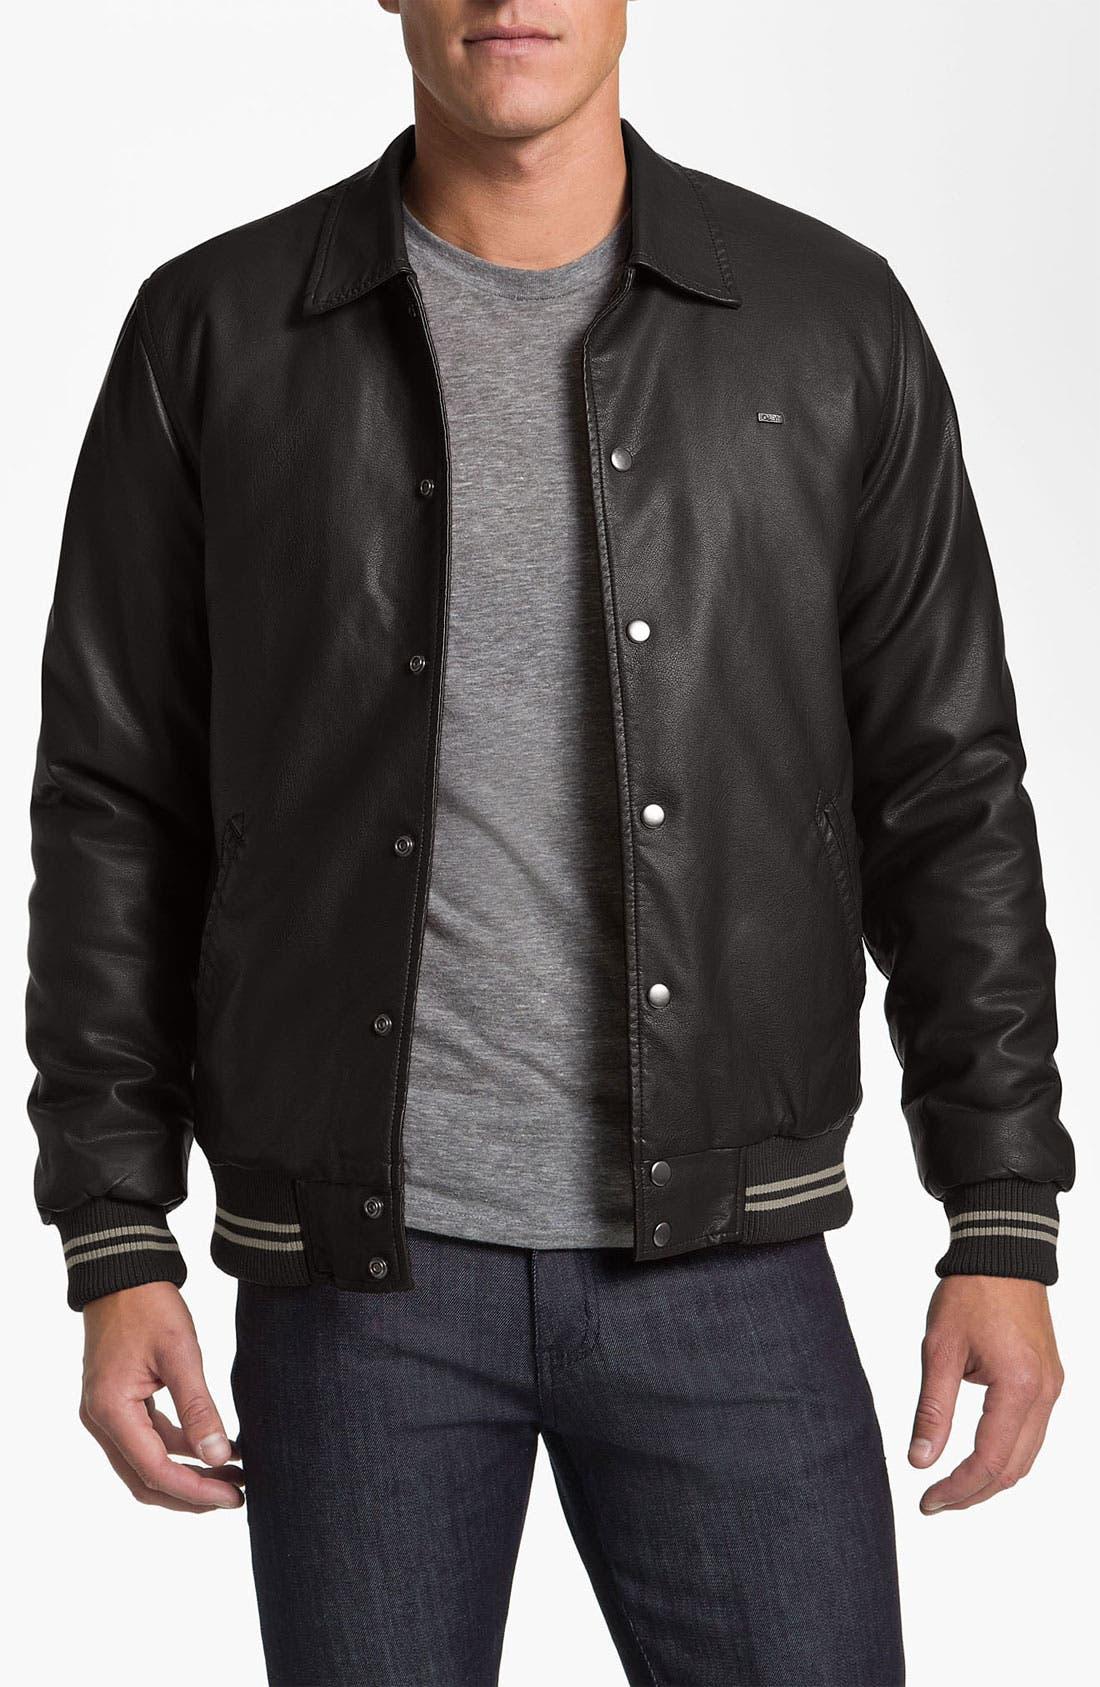 Alternate Image 1 Selected - Obey Classic Varsity Jacket